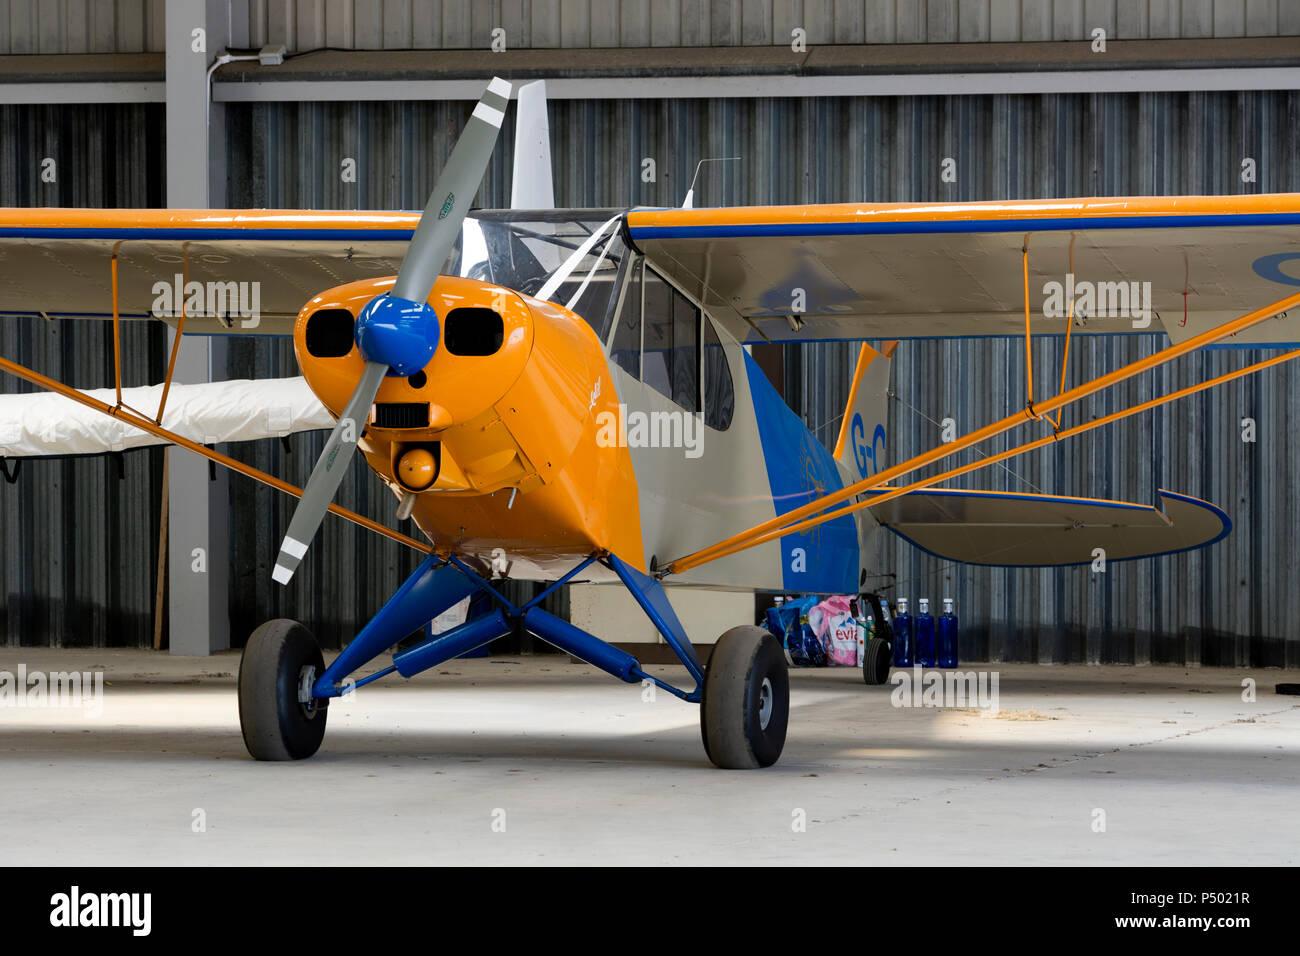 Piper PA-18-150 Super Cub at Turweston Aerodrome, Buckinghamshire, UK (G-CIIC) - Stock Image